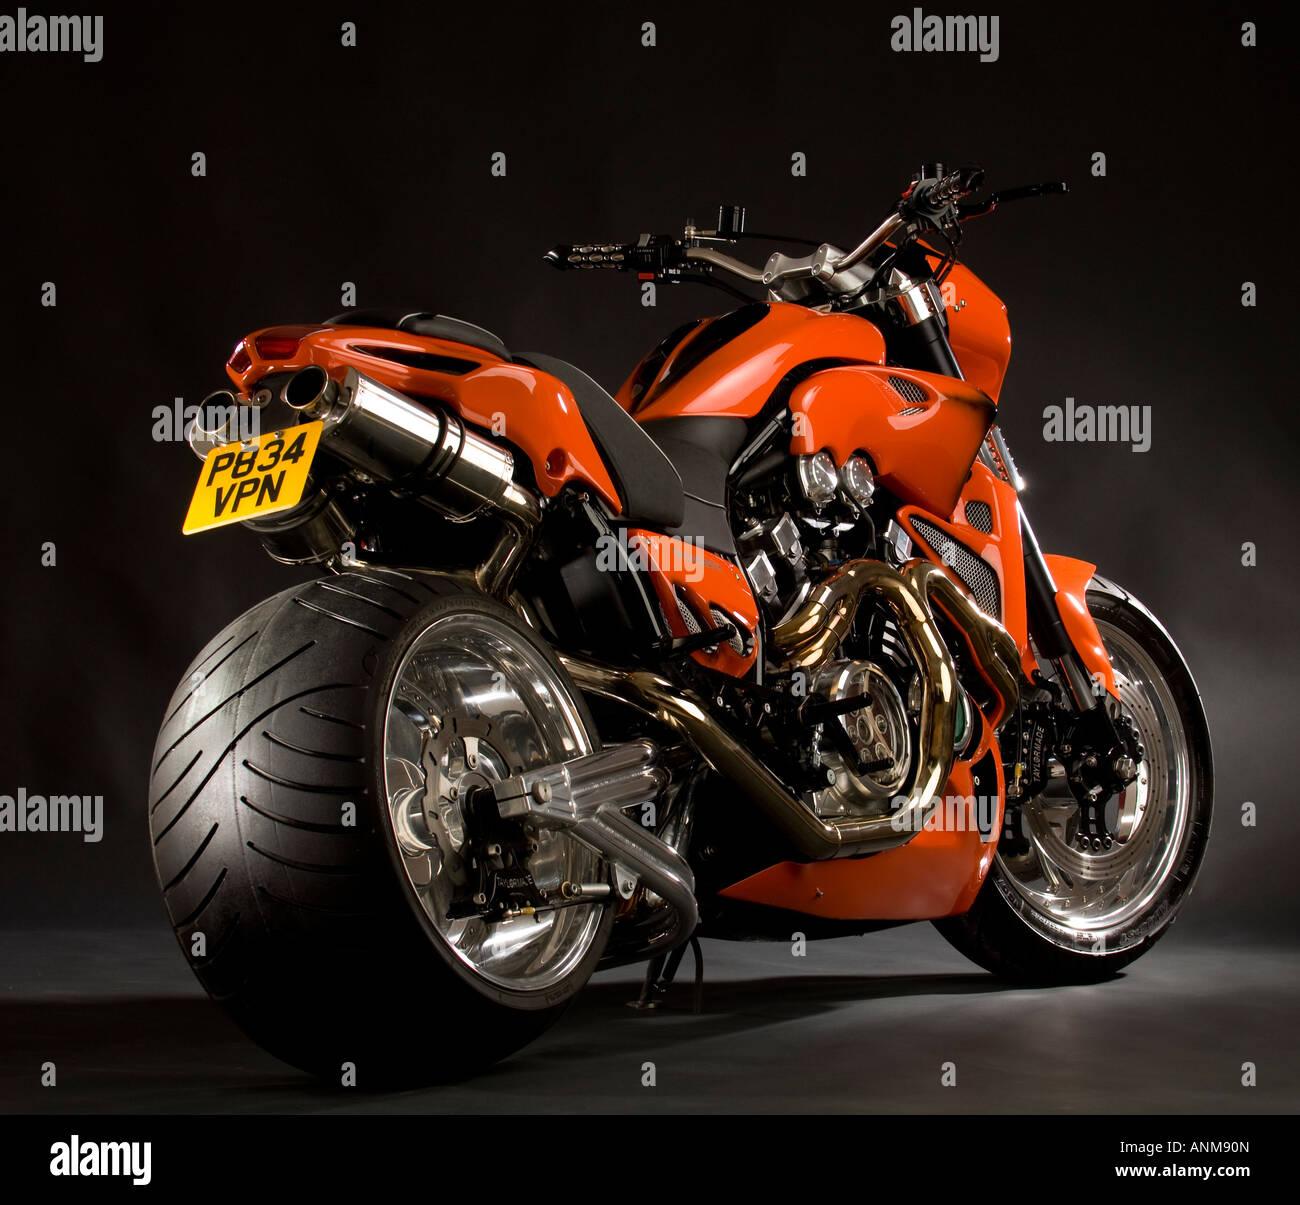 Bright Orange Yamaha V Max Vmax Bike Custom Cruiser Chopper Motorcycle With Huge Fat Rear Tyre Conversion